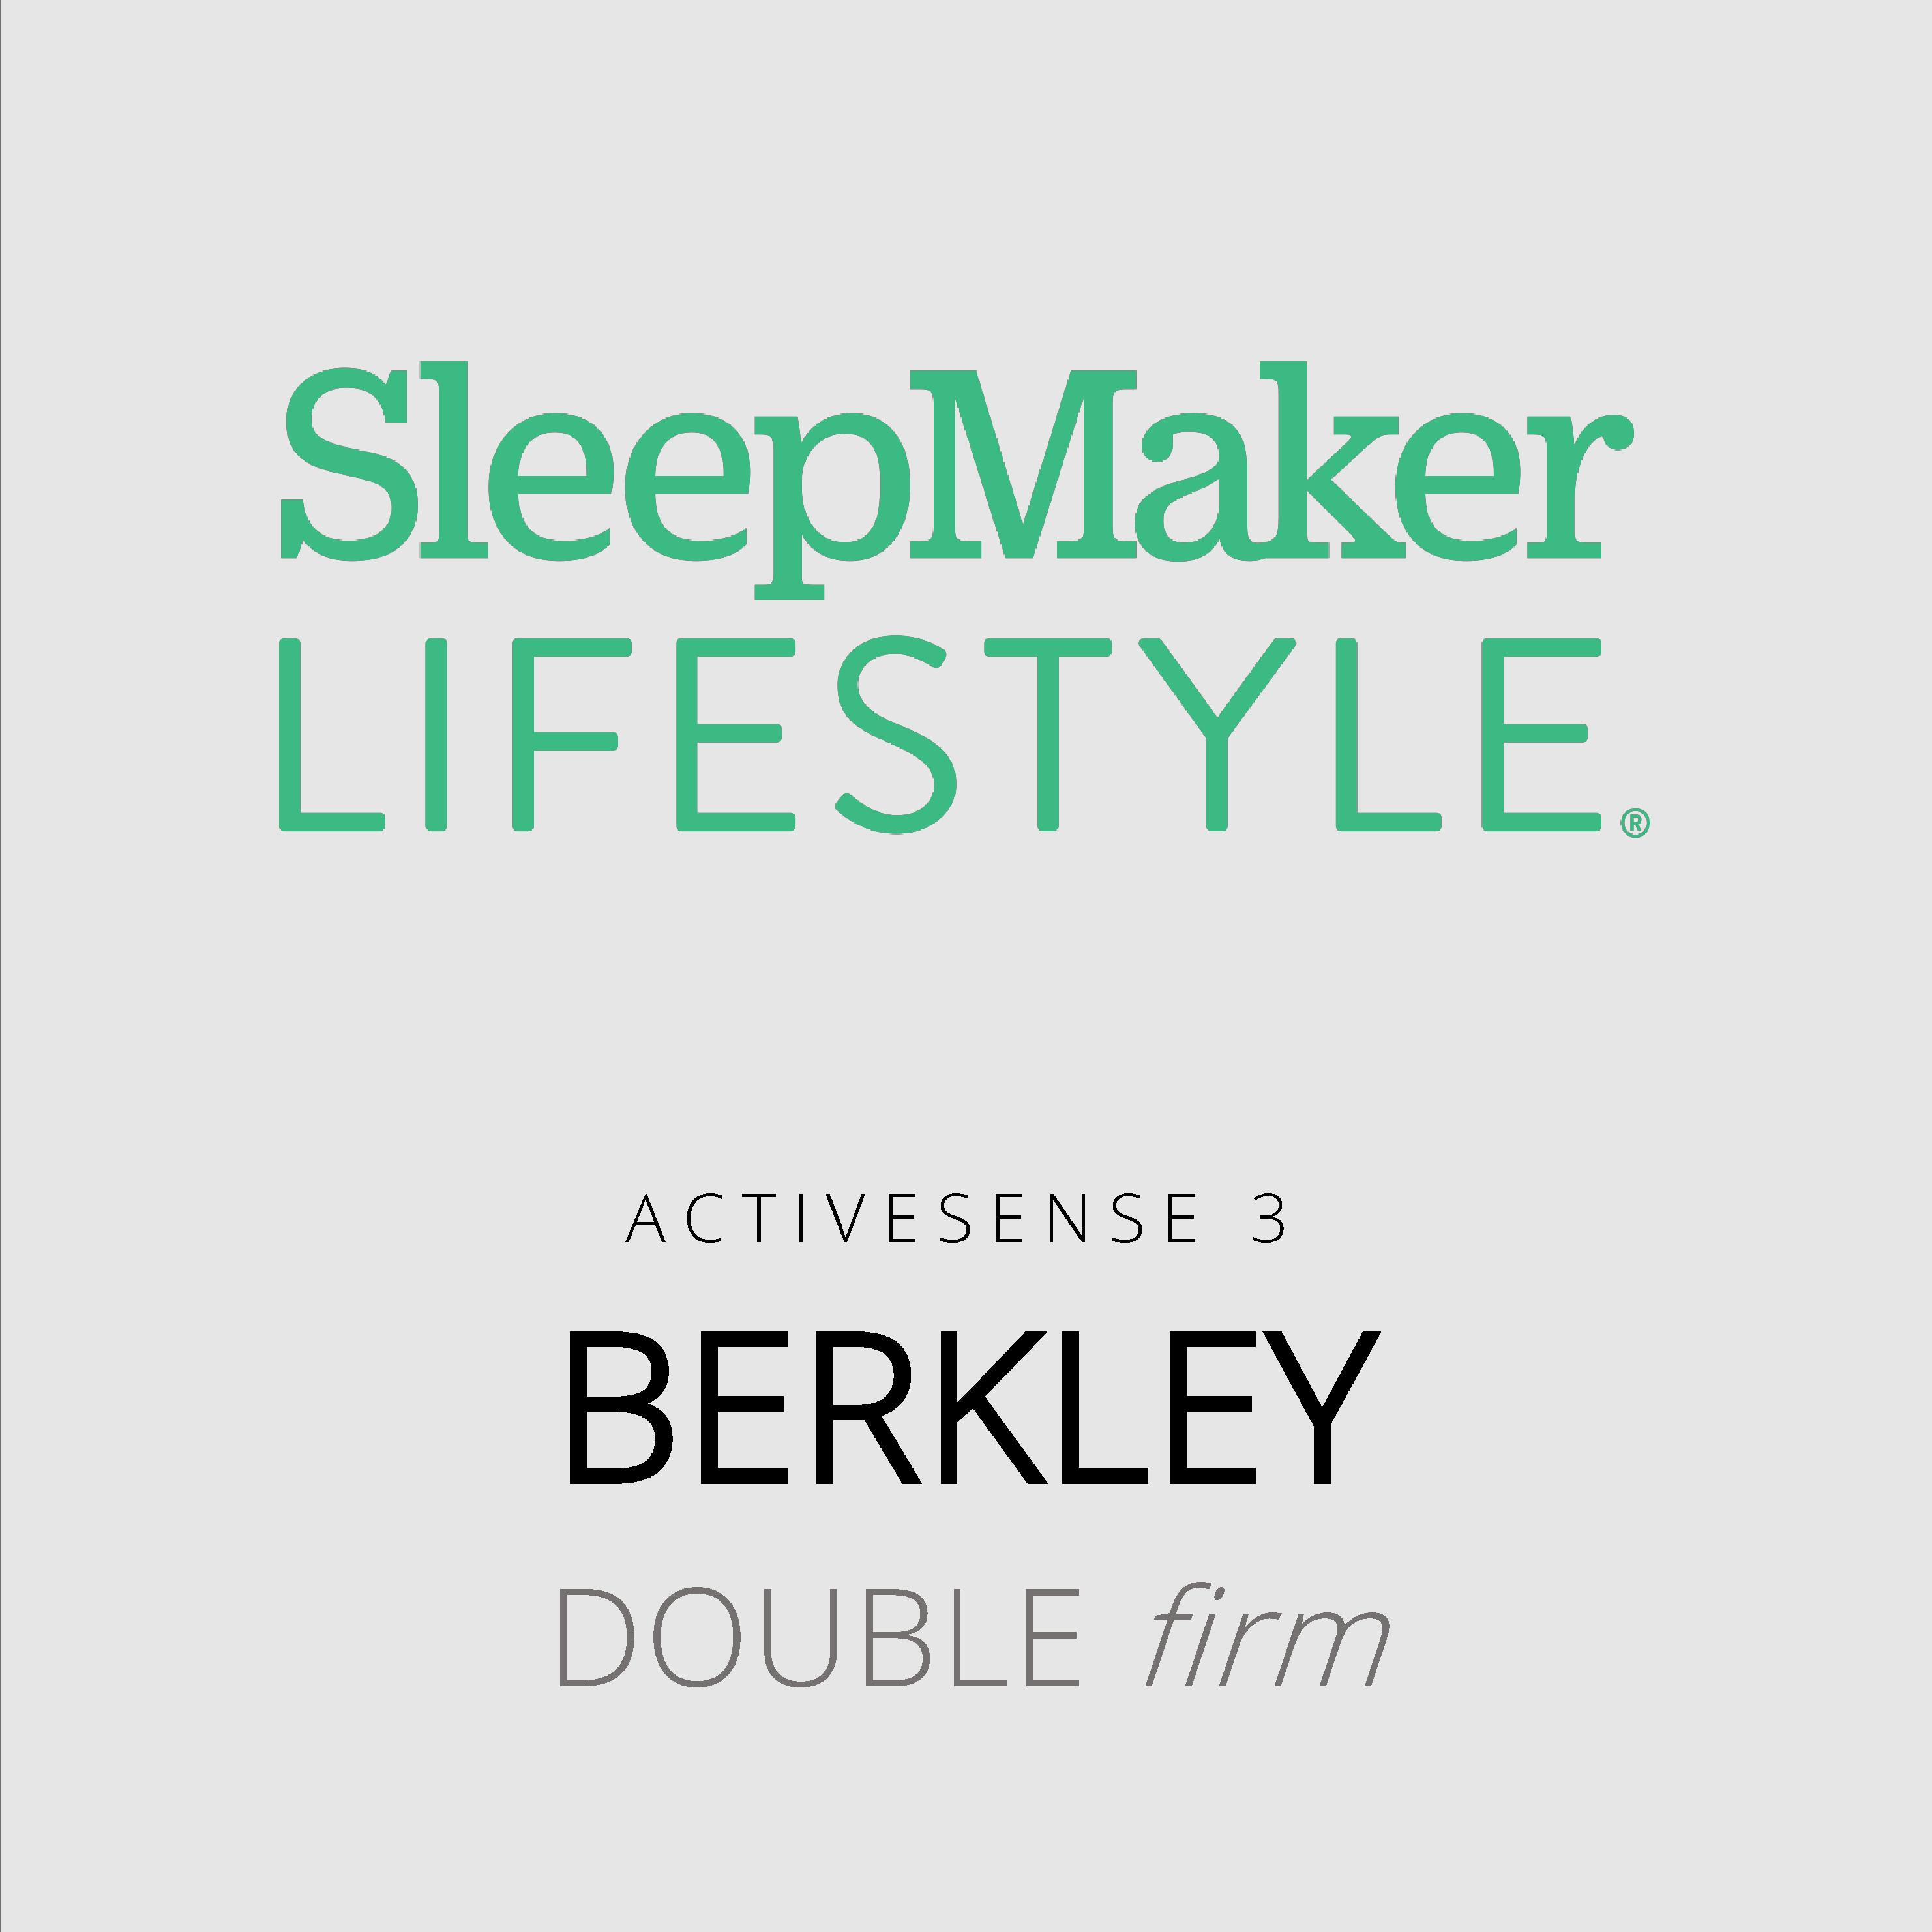 SleepMaker Lifestyle – Berkley – ActiveSense 3 – Double Firm Mattress